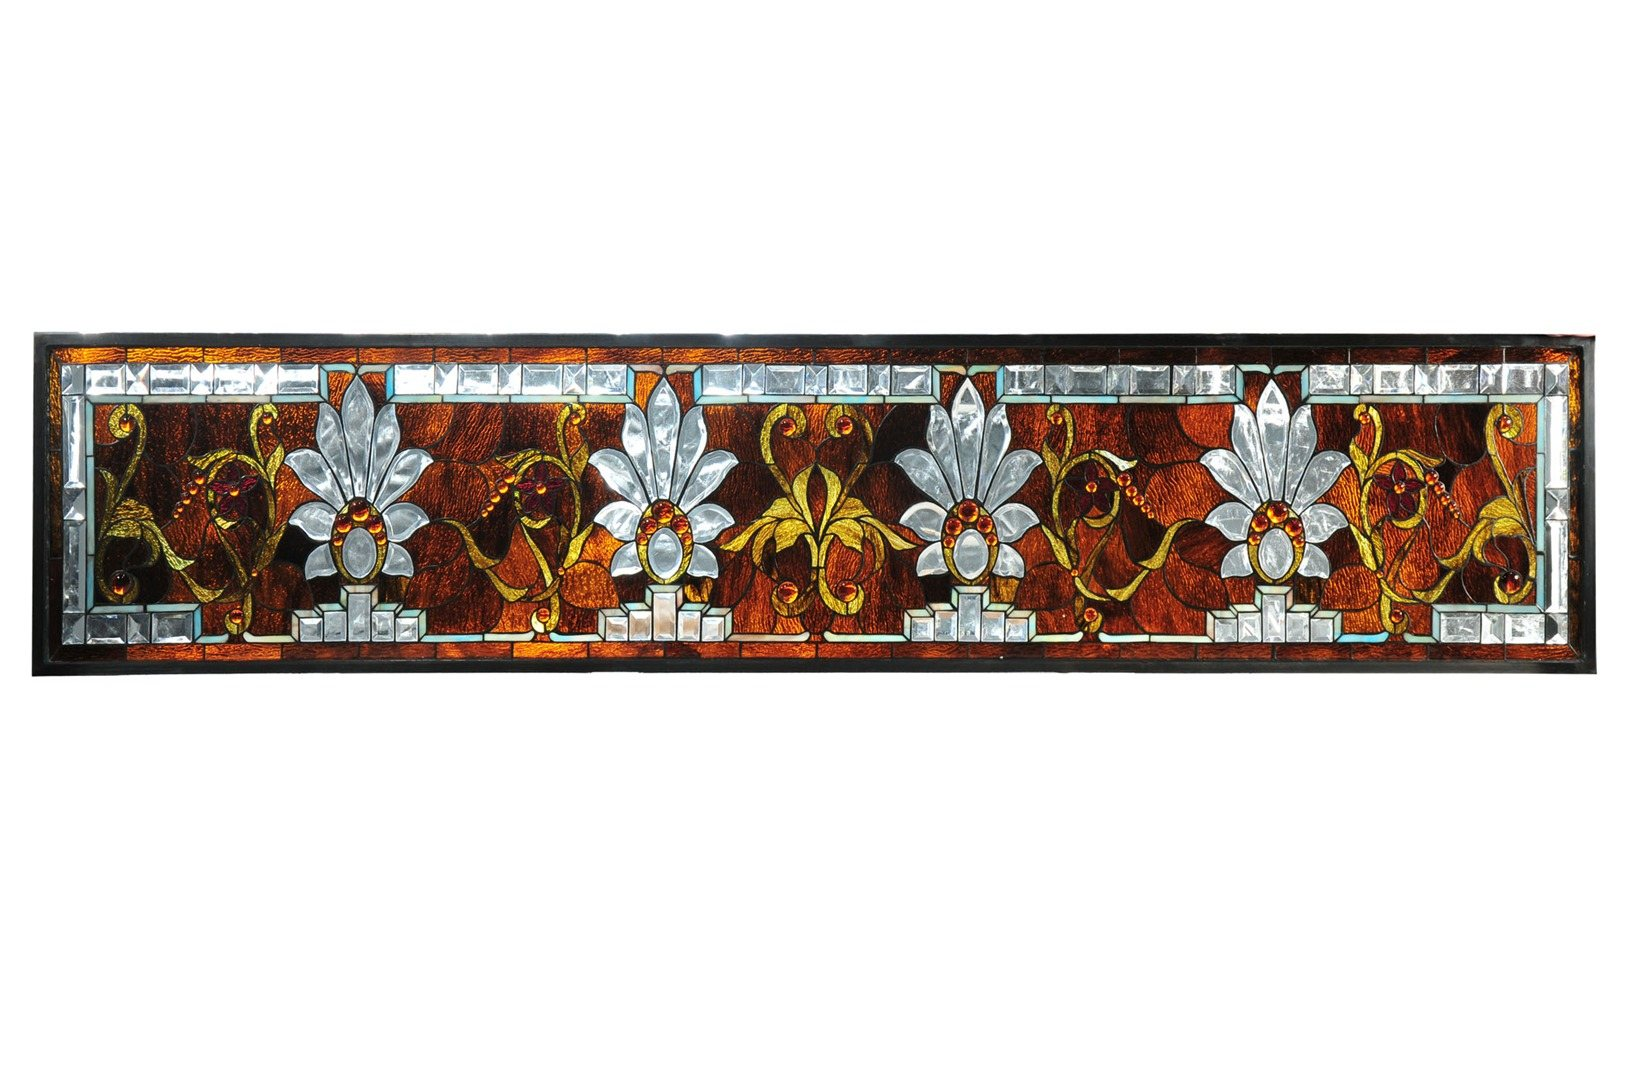 TIFFANY STYLE WINDOW 16